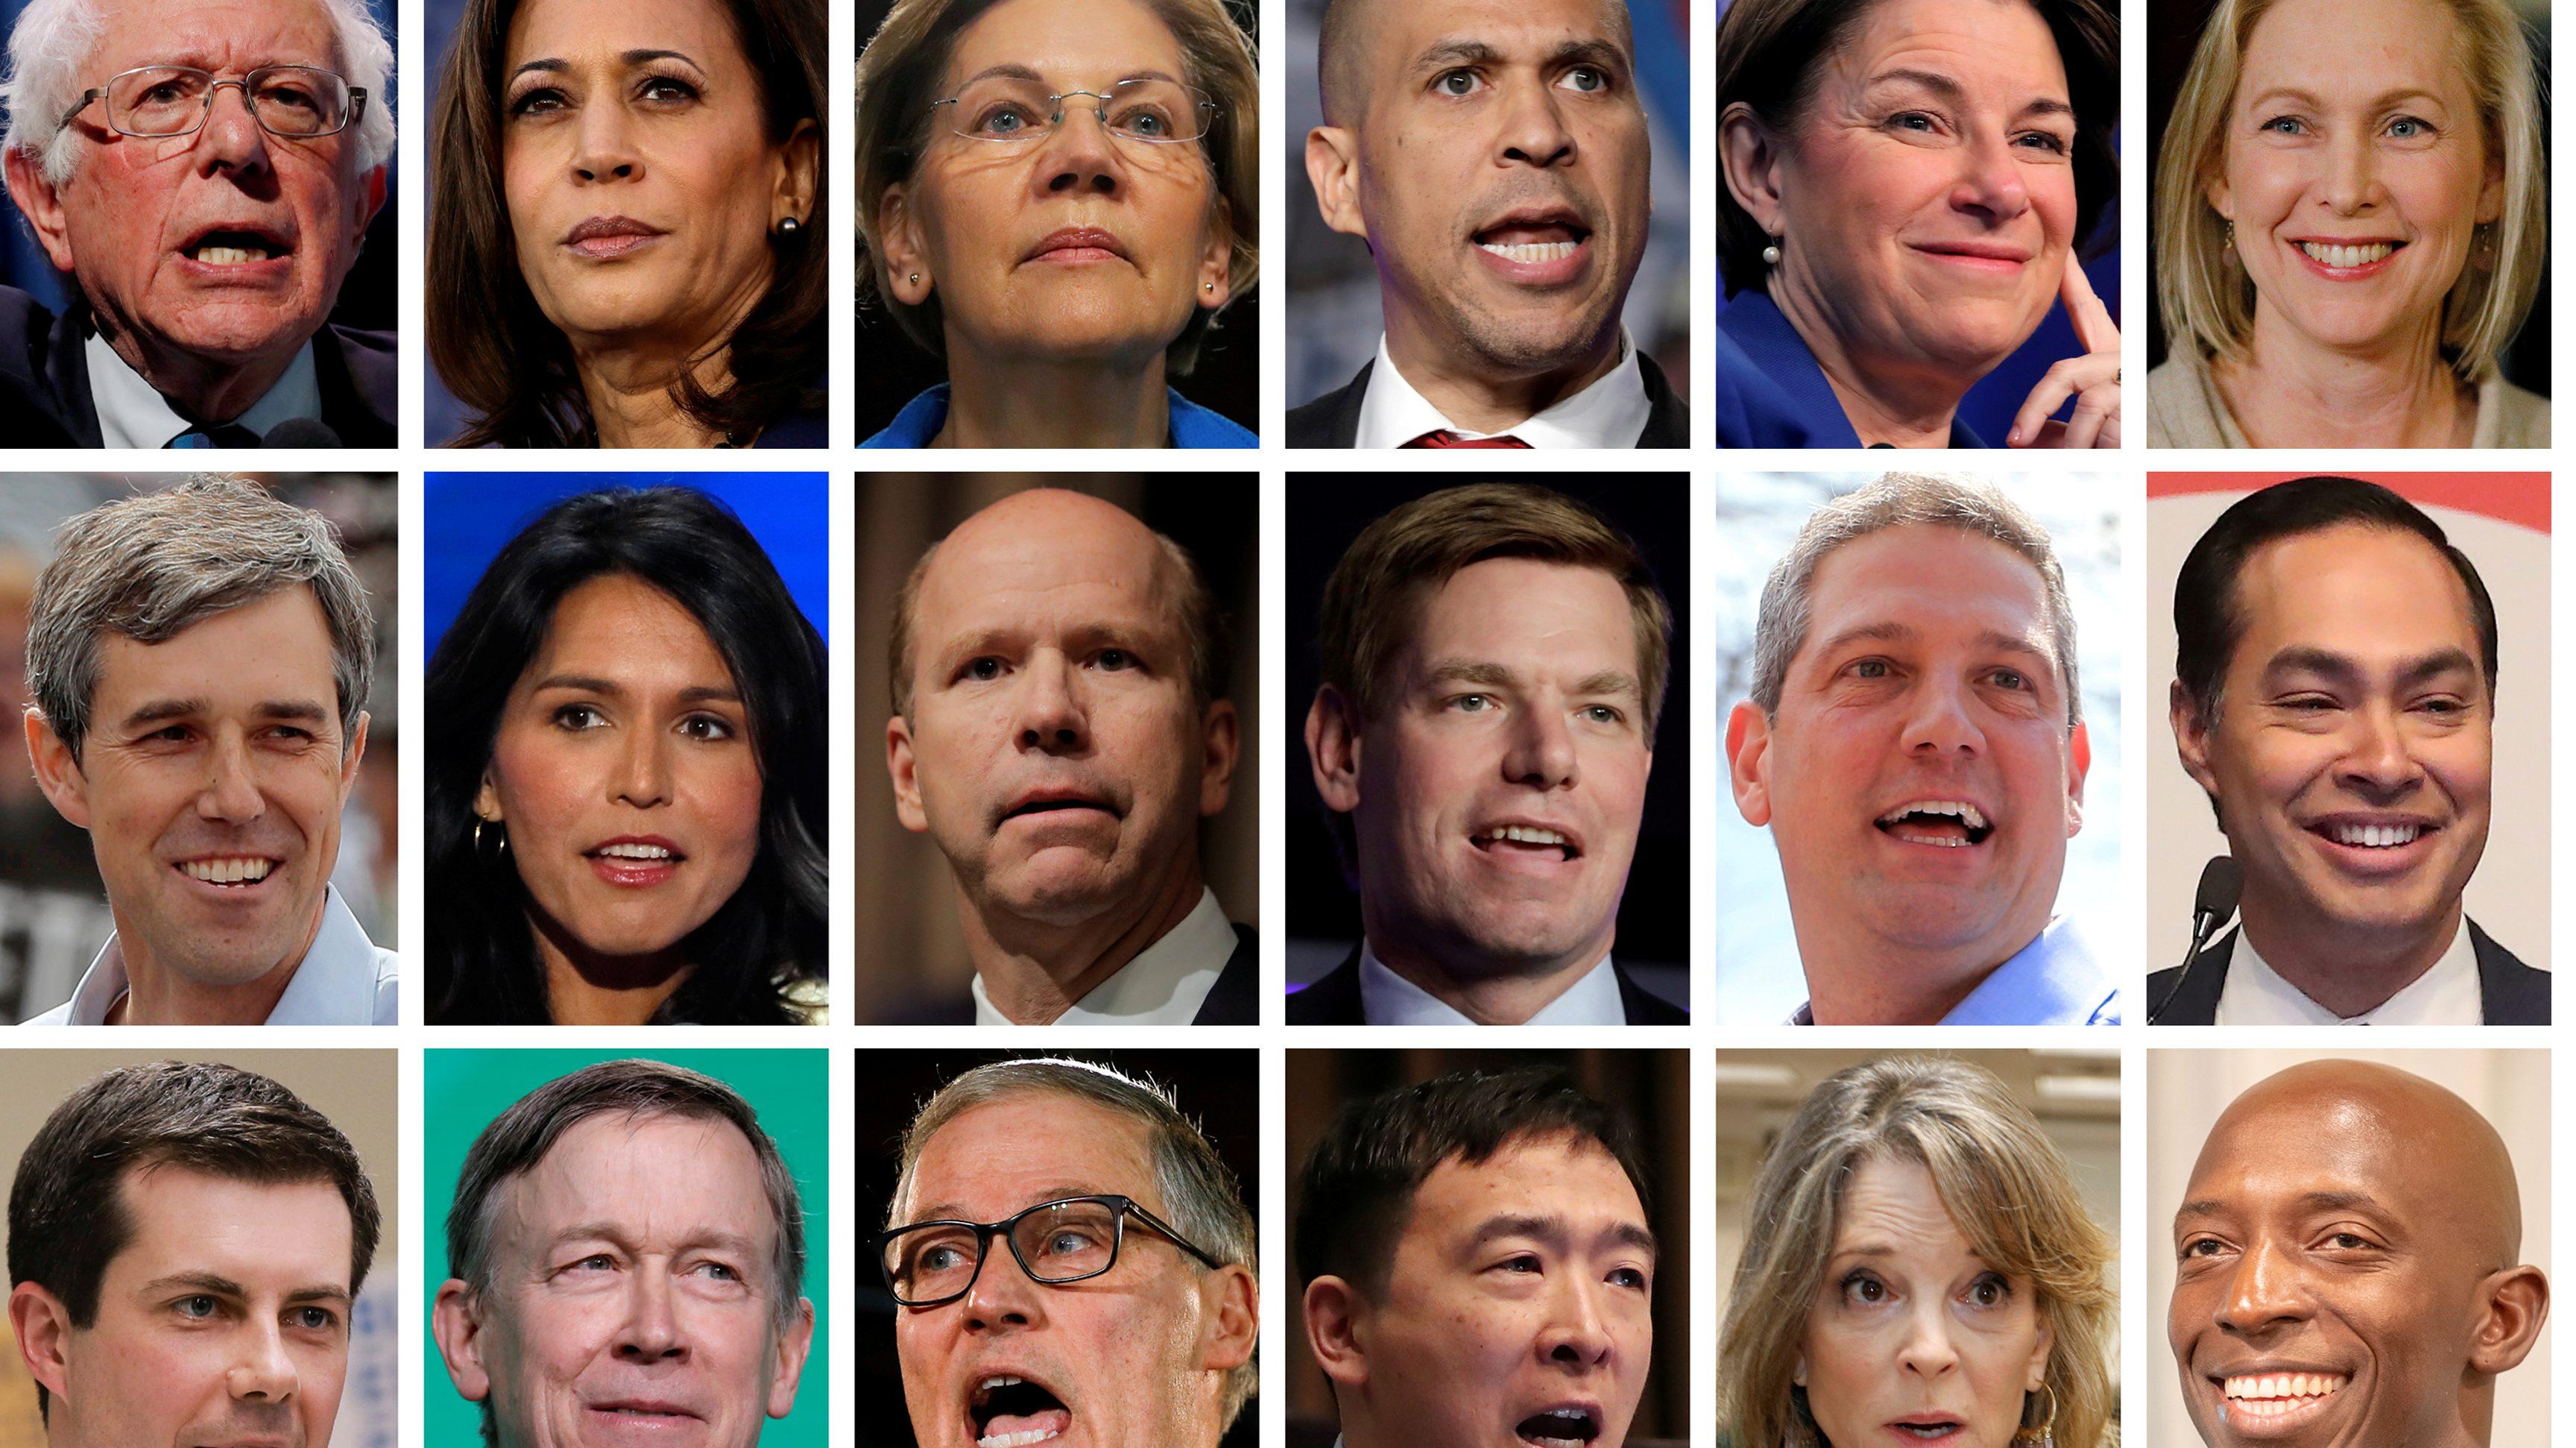 2020 Democratic presidential candidates are seen in a combination of file photos (L-R top row): U.S. Senators Bernie Sanders, Kamala Harris, Elizabeth Warren, Cory Booker, Amy Klobuchar, and Kirsten Gillibrand. (L-R middle row): Former Texas congressman Beto O'Rourke, U.S. Representatives Tulsi Gabbard, John Delaney, Eric Swalwell, Tim Ryan, and former HUD Secretary Julian Castro. (L-R bottom row): Mayor Pete Buttigieg, Former Gov. John Hickenlooper, Gov. Jay Inslee, Andrew Yang, Marianne Williamson, and Mayor Wayne Messam.